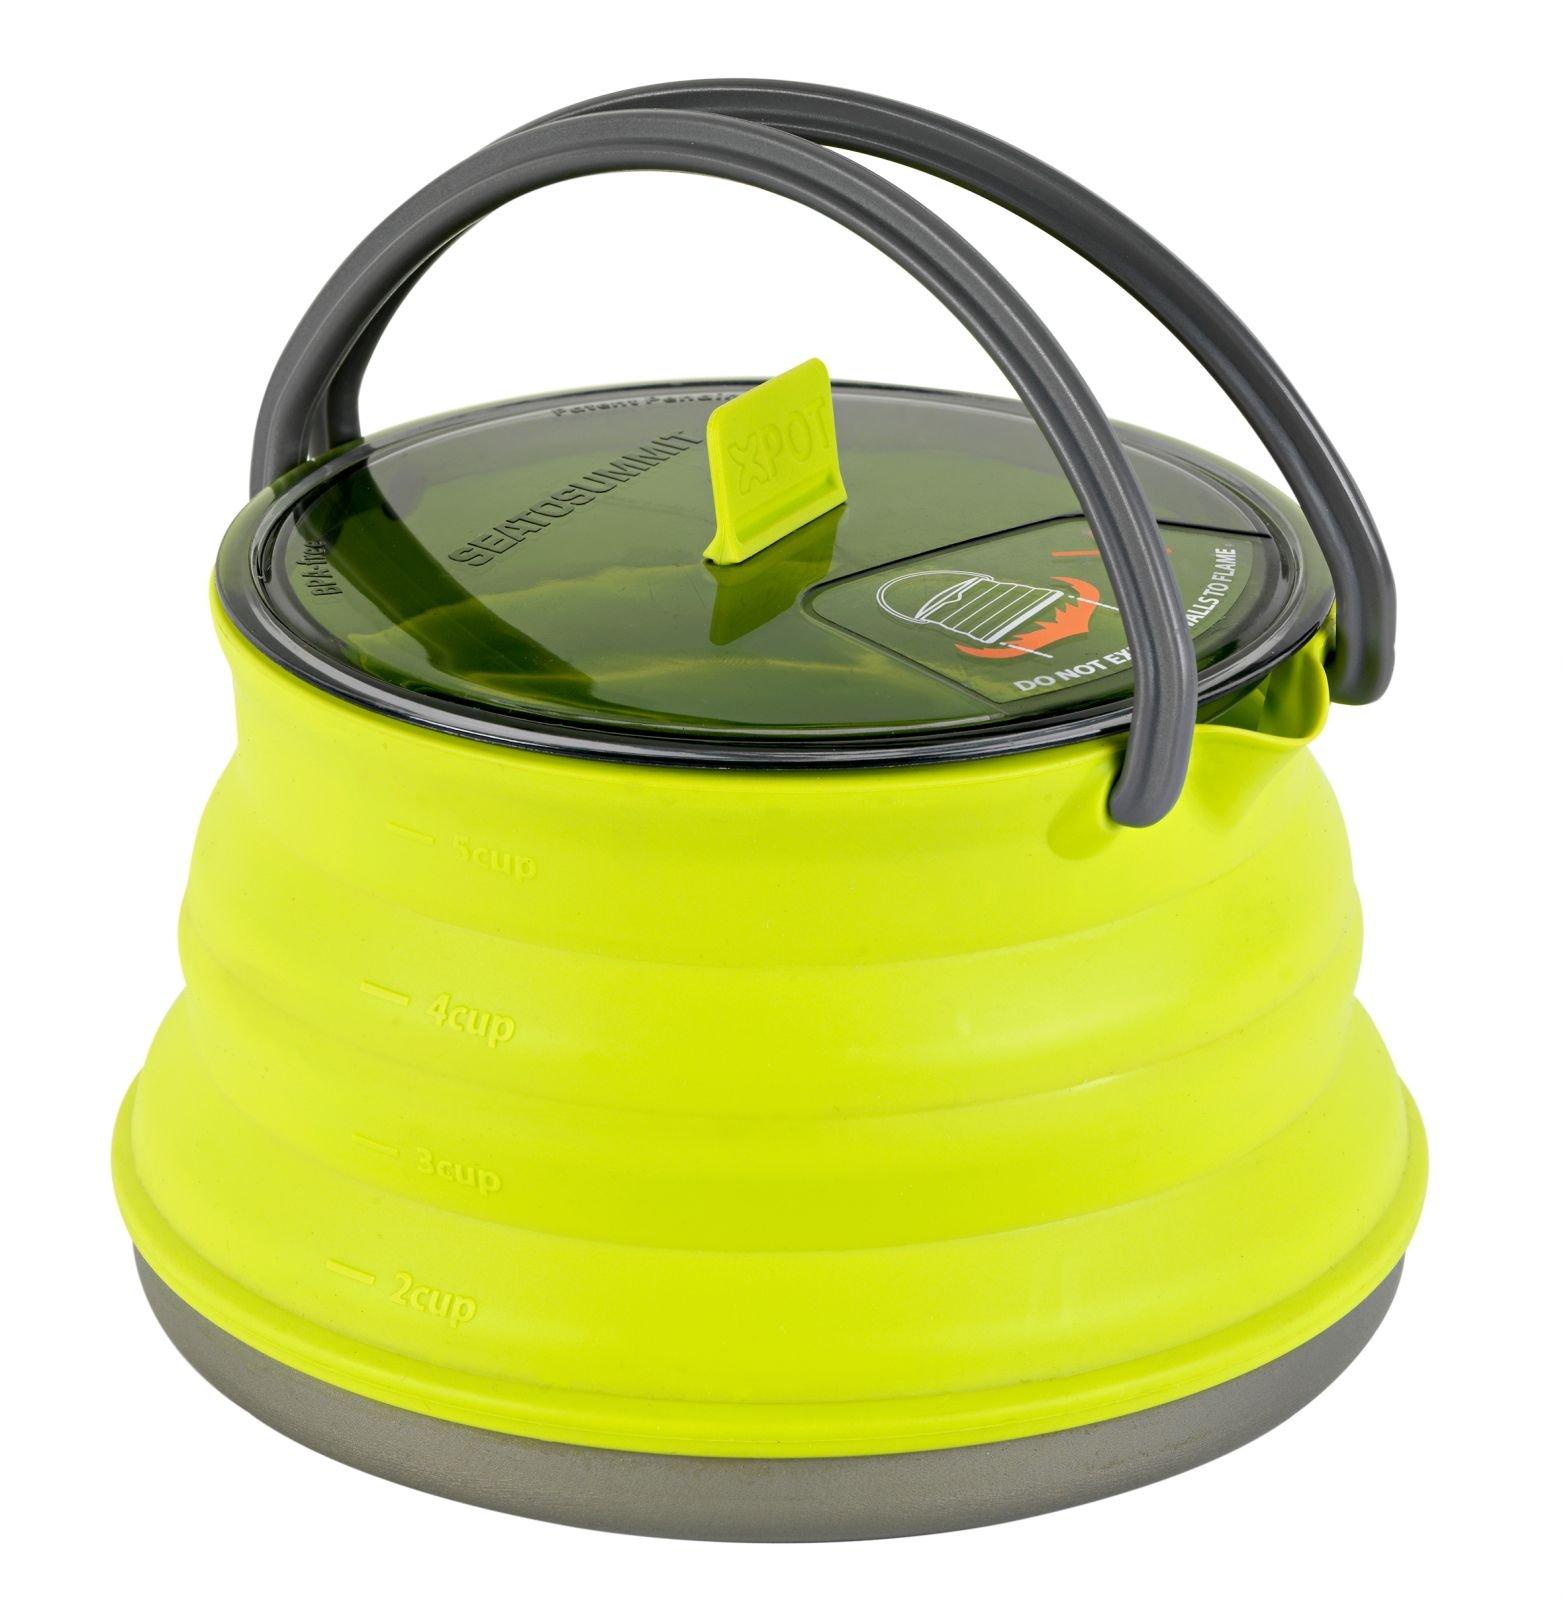 Sea to Summit X-Pot/Kettle, 1.3 L, Lime Green